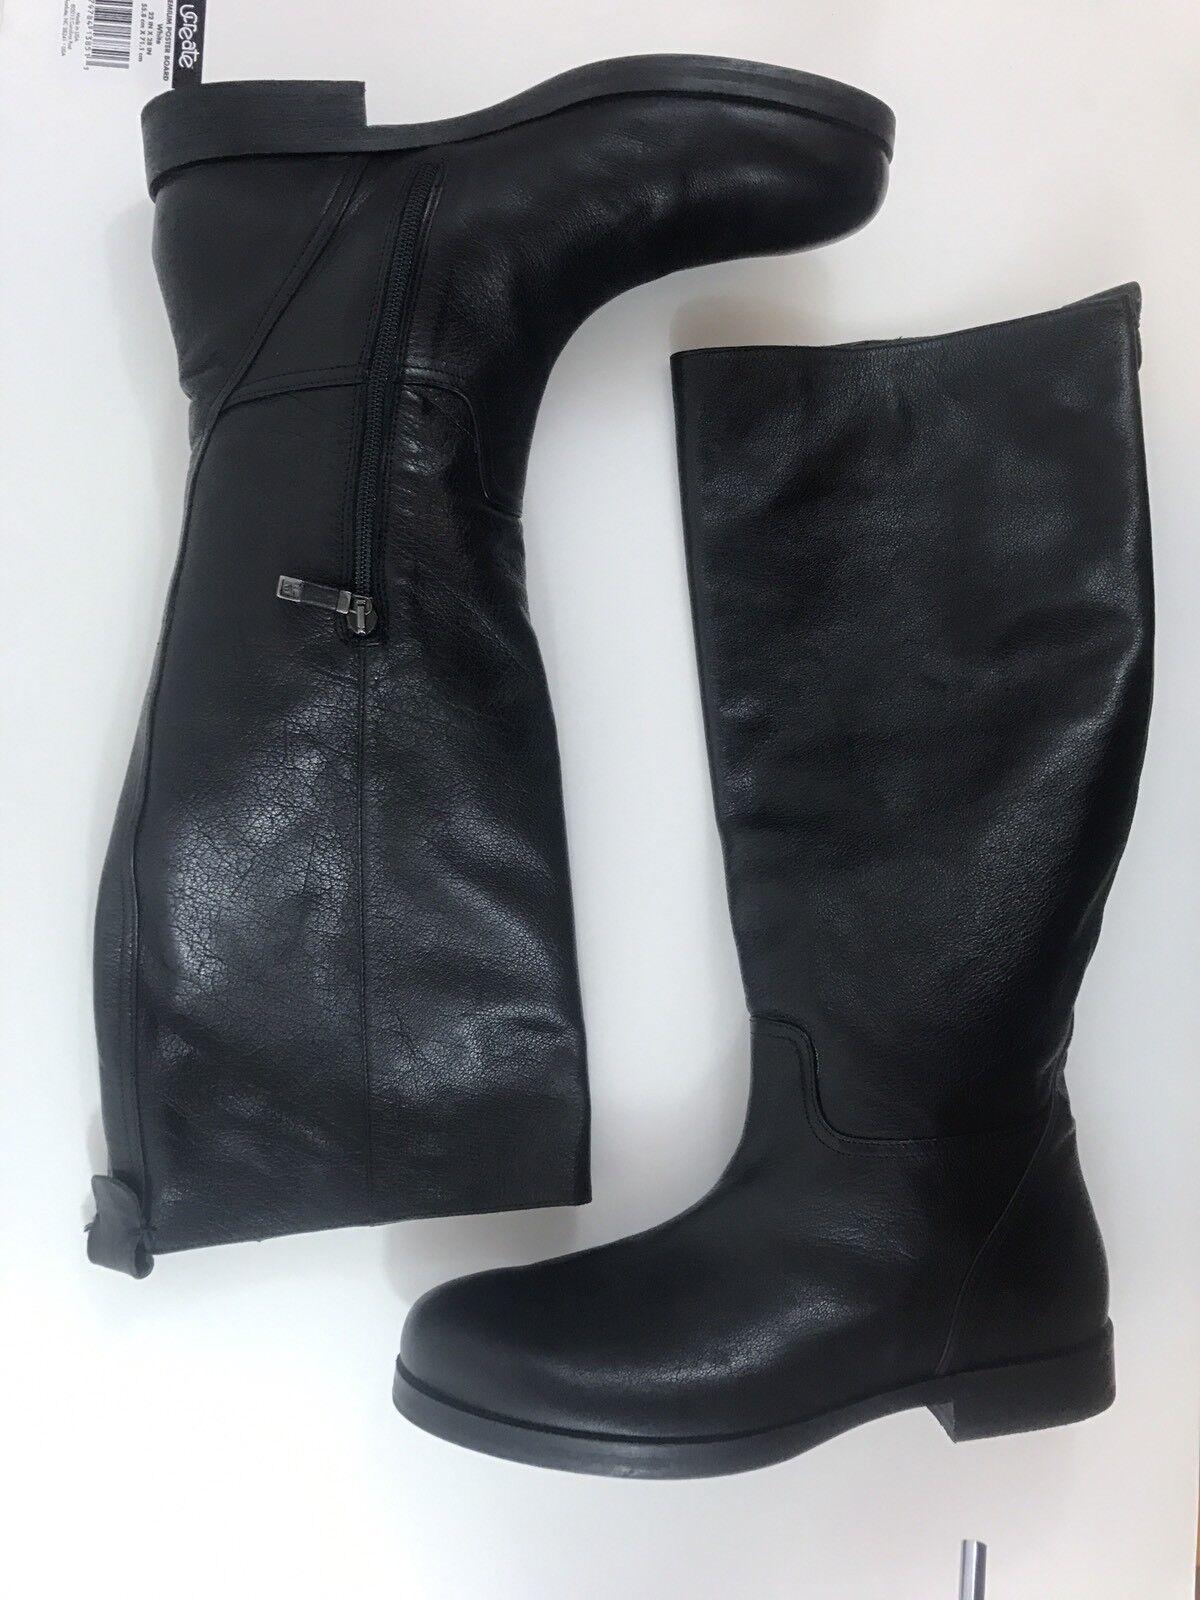 Alberto FERMANI AF Knee High Boots Womens Size 41 PLAIN BLACK